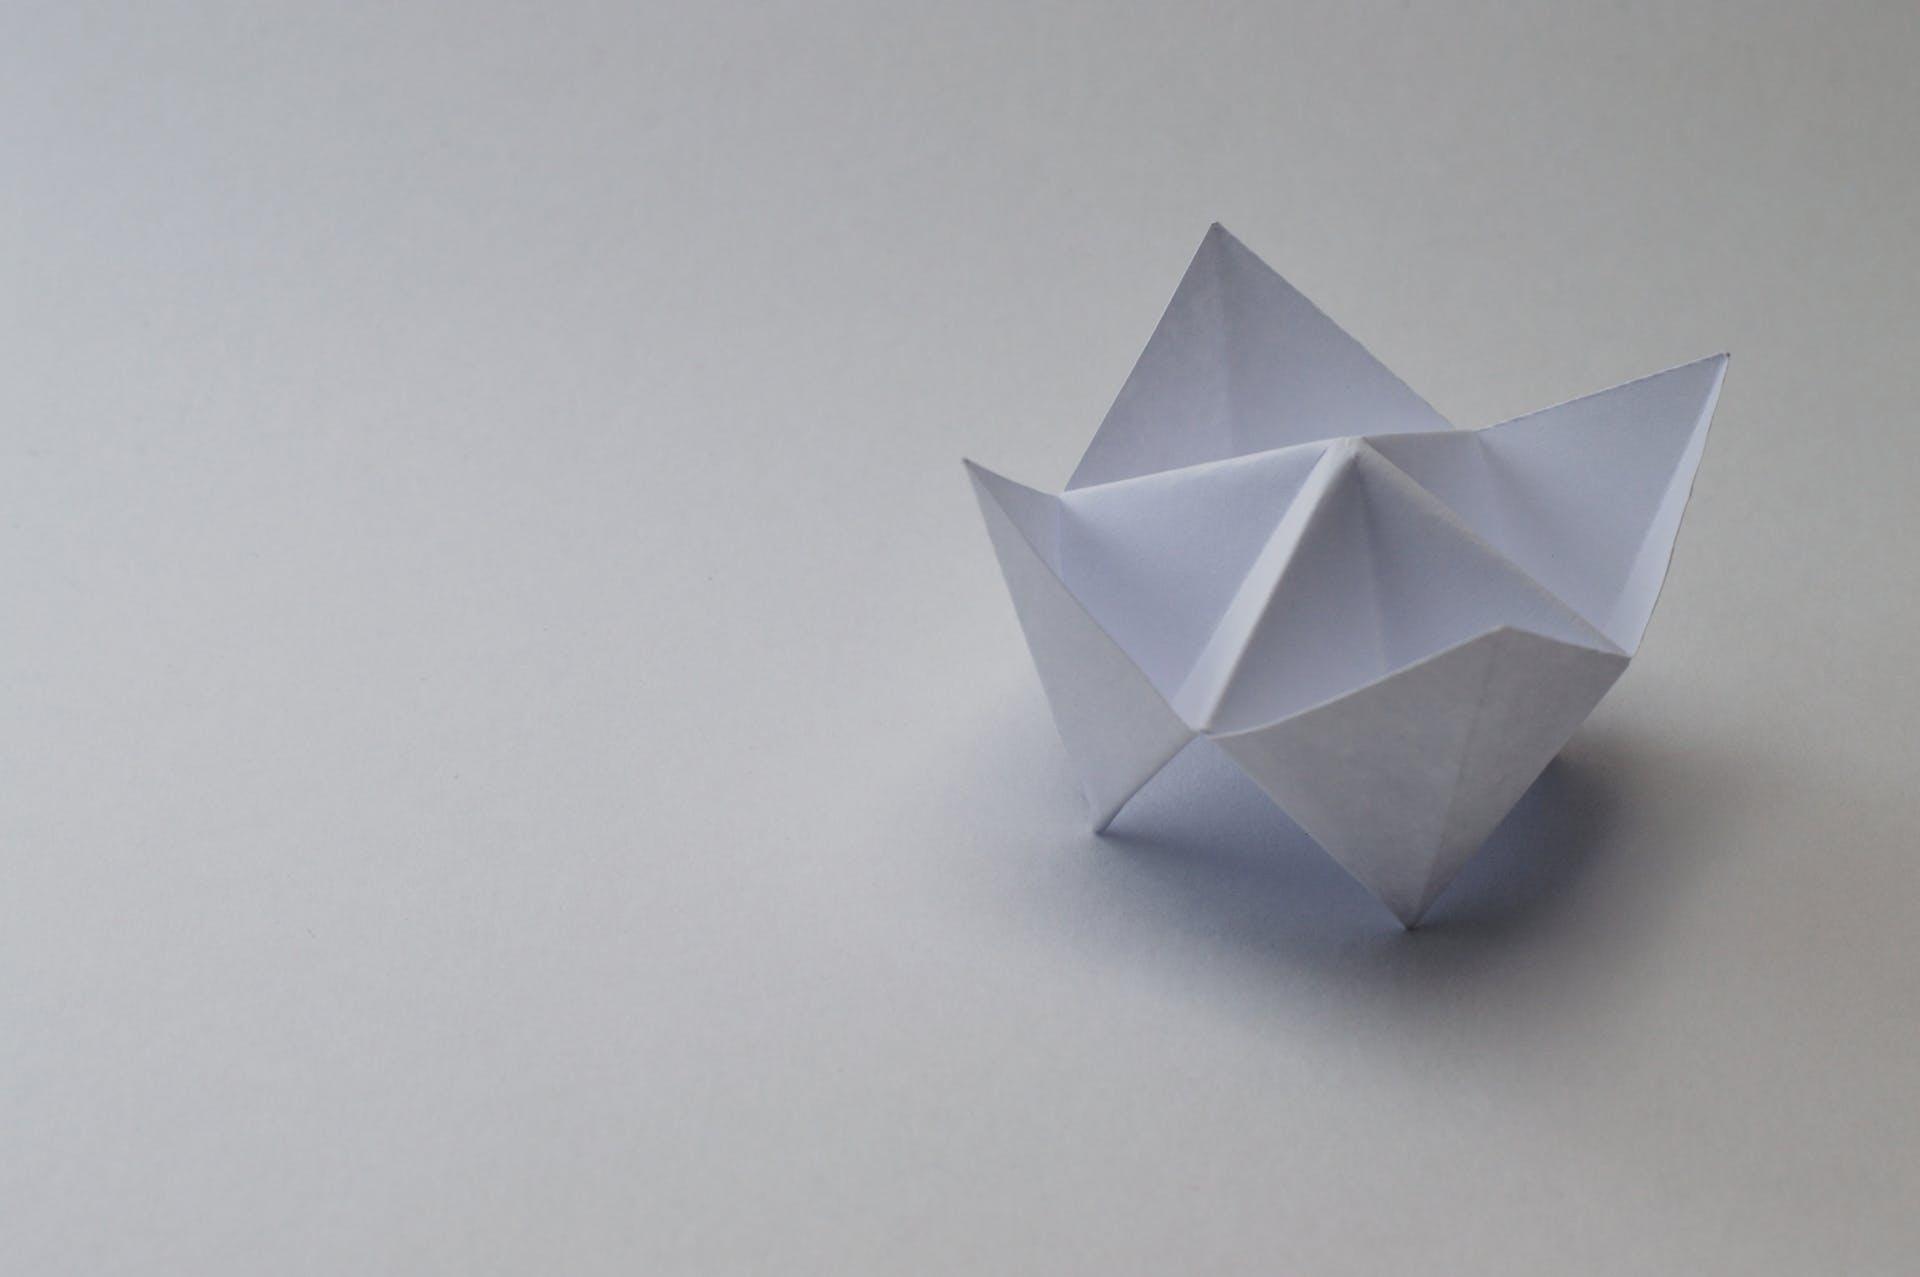 decorative game craft joy beautiful artistic asian handmade origami japanese